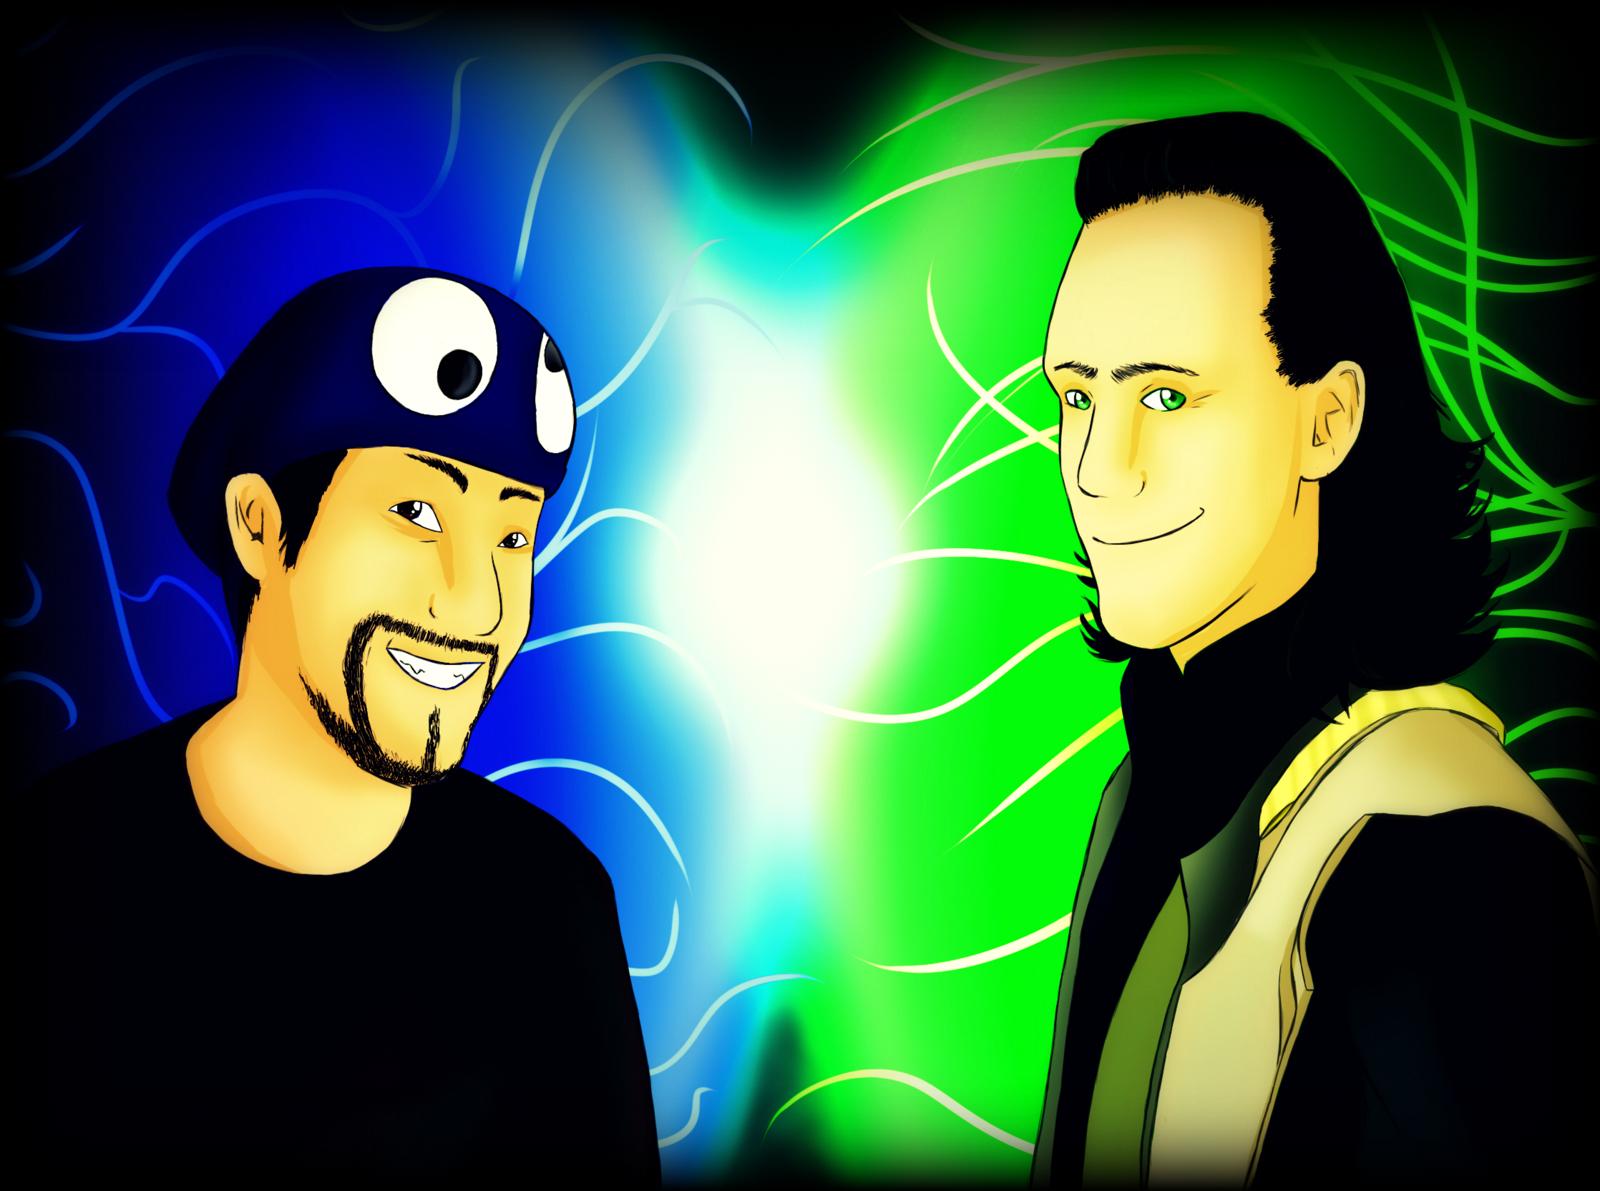 Uberhaxornova and Loki Laufeyson by Kaabi96 on DeviantArt Uberhaxornova Fan Art